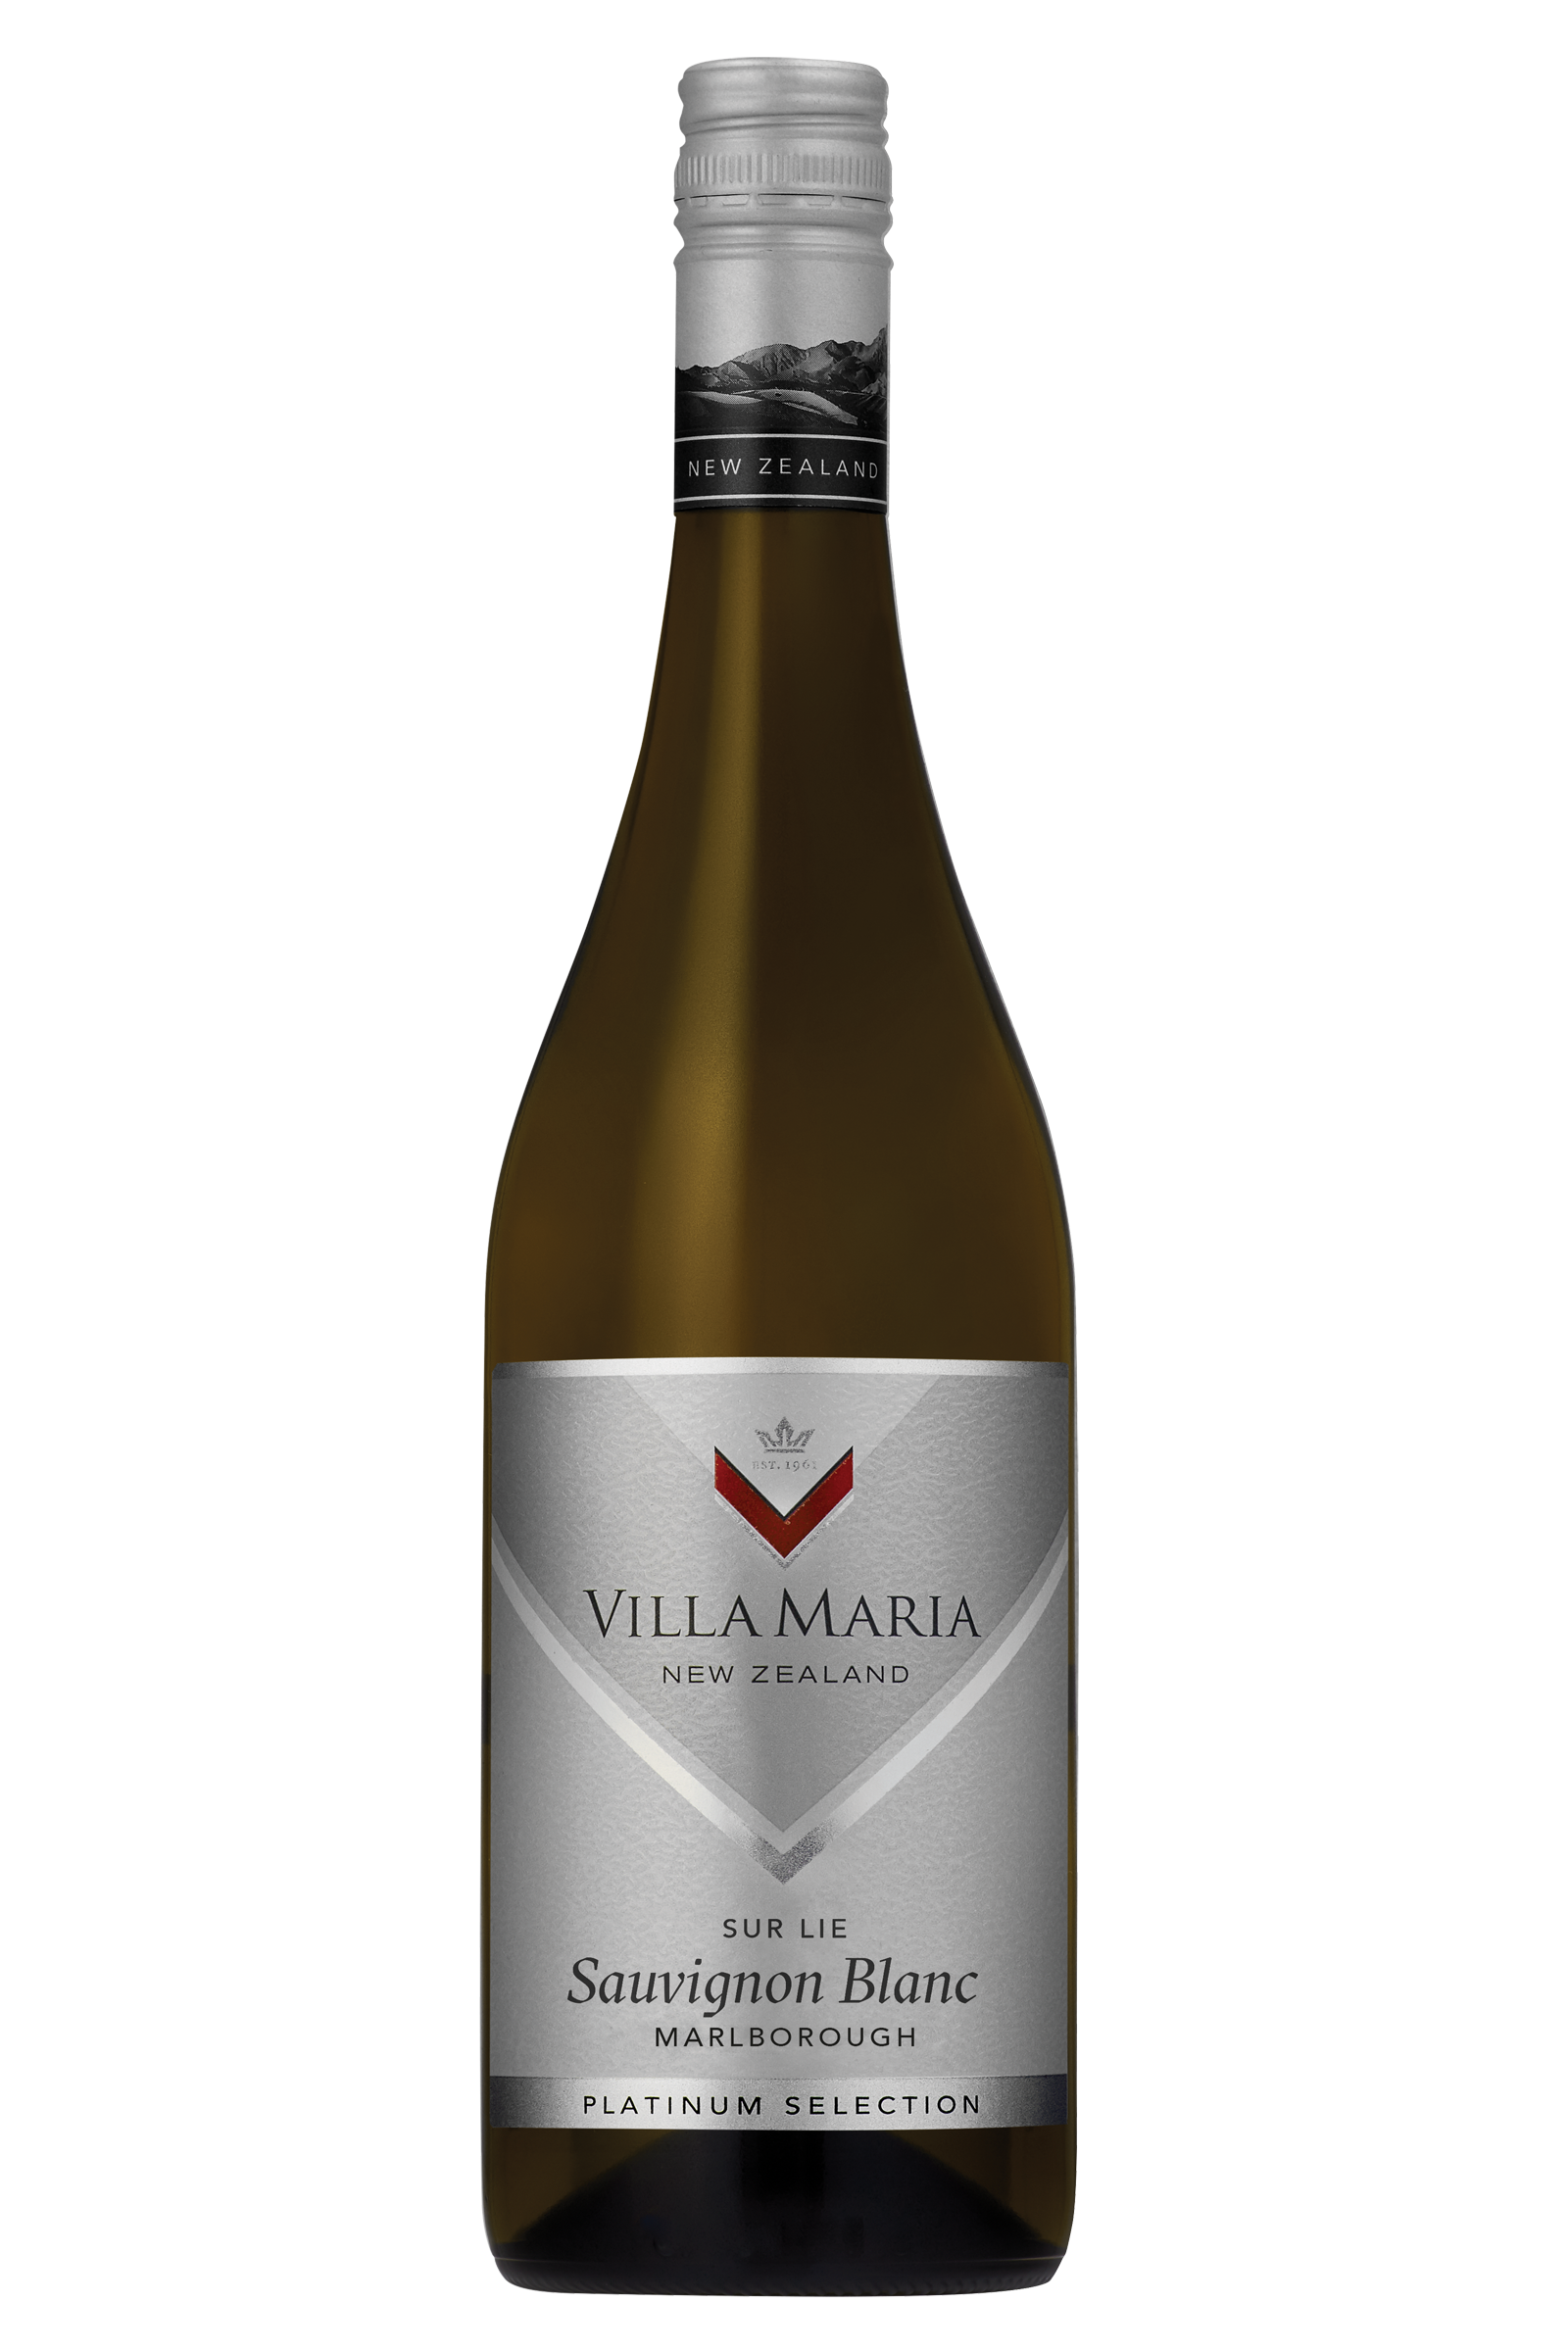 Villa Maria platinum selection wine